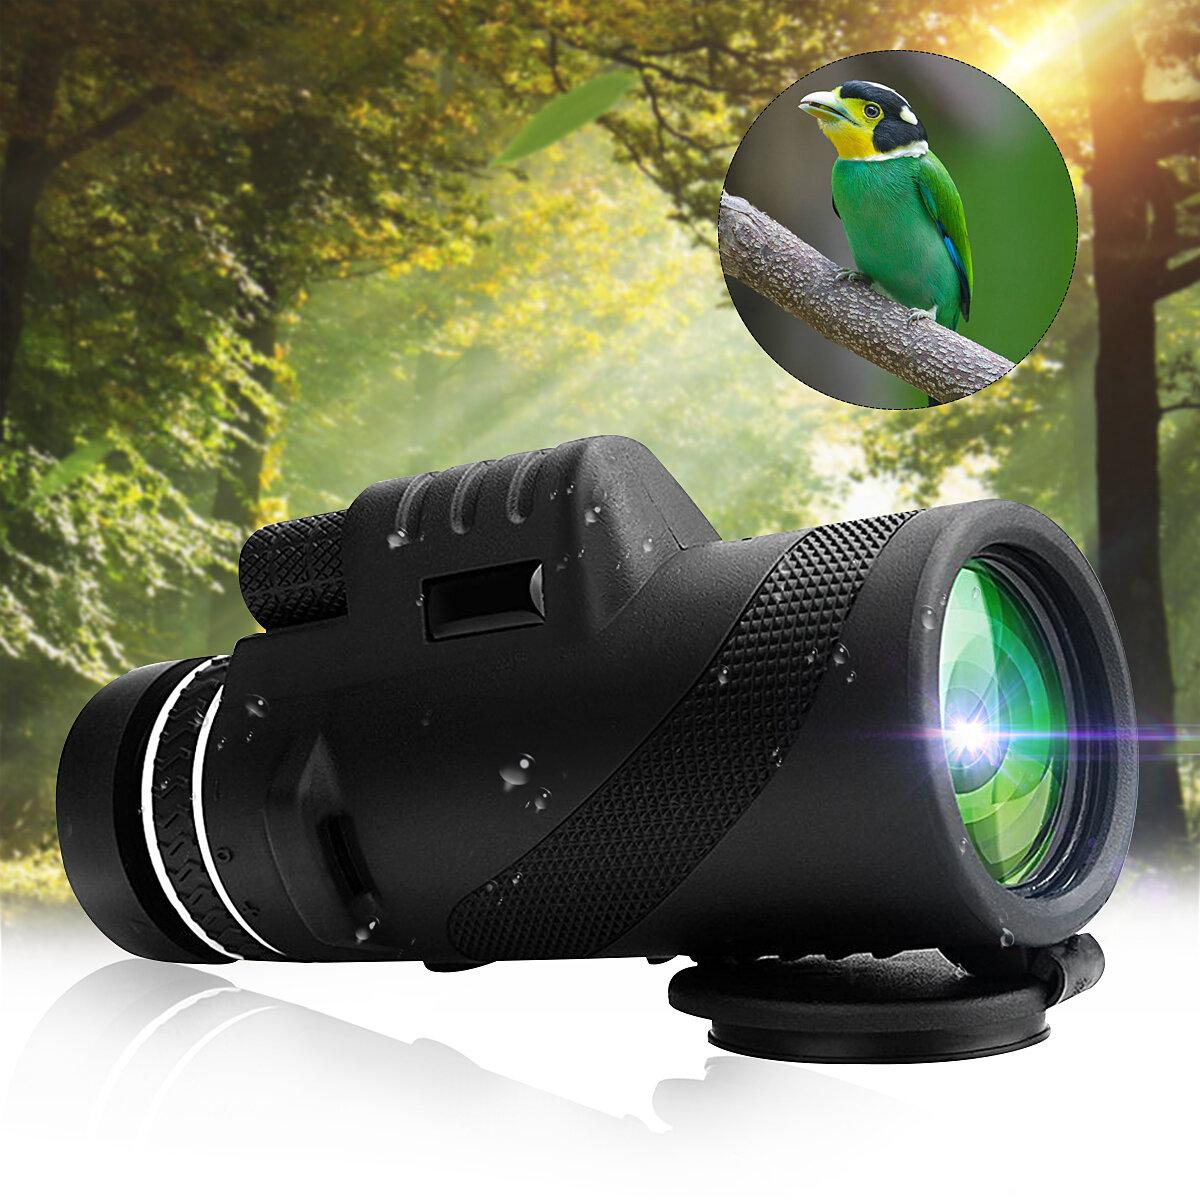 40x60 Monocular Outdoor campeggio Telescopio HD Zoom Escursionismo Night Vision